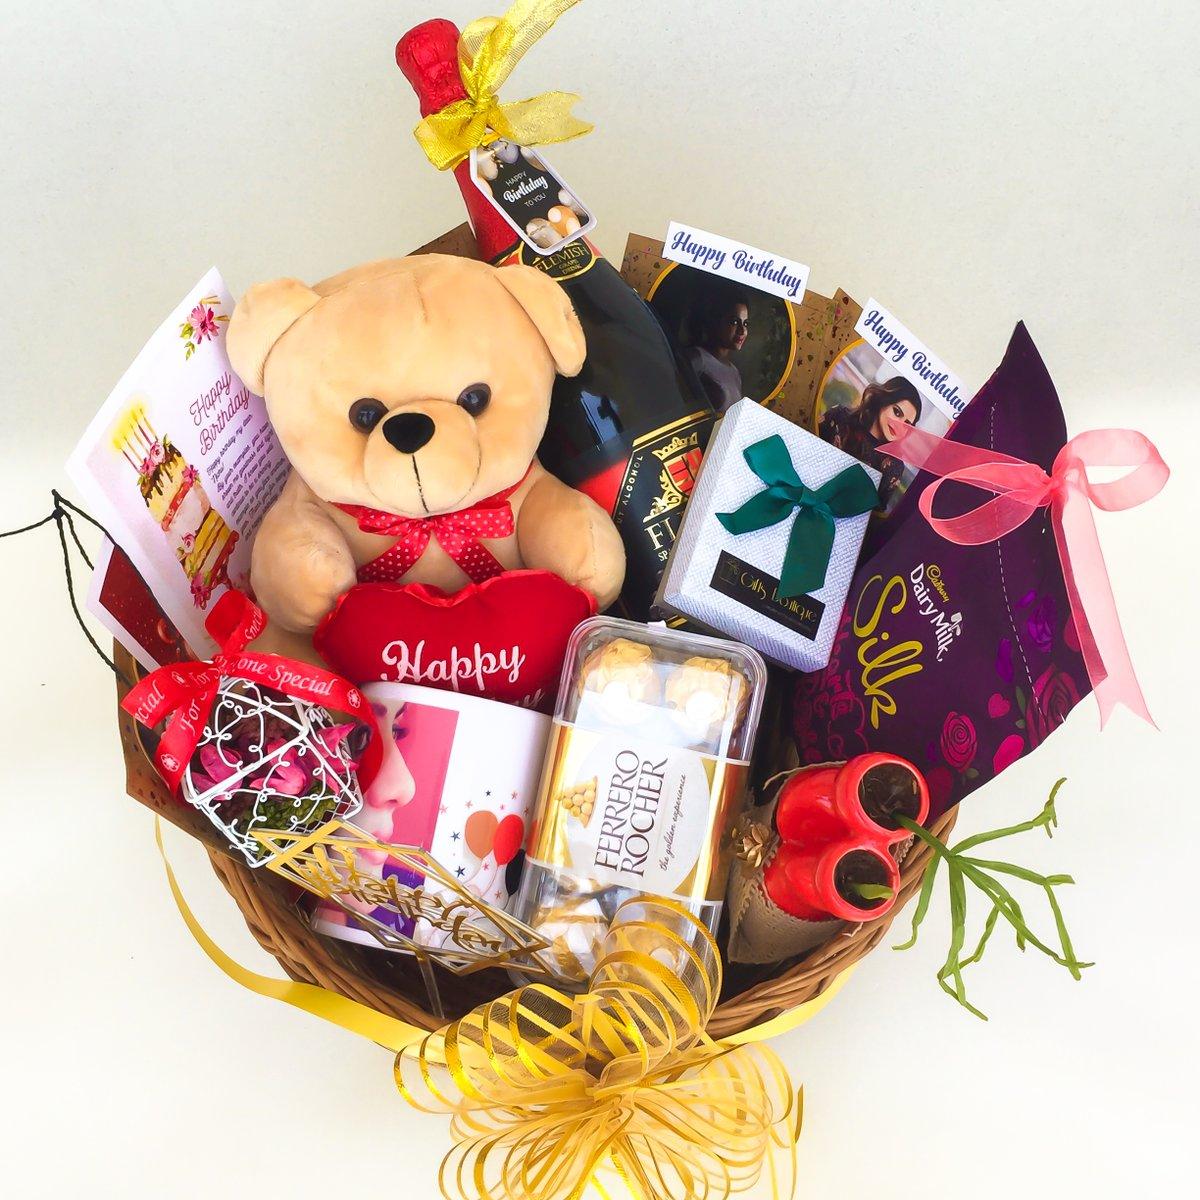 Special customized birthday hamper for @cindrella_jacob  #birthdaygirl #birthday #special #giftsets #specialoccasions #birthdayhamper #kochindiaries #kochigifts #keralam #keralagram #keralagallery #keraladiaries #kochigrams #goodgifts #hampers #birthdayspecial #ernakulamdiariespic.twitter.com/kkVuhf8lMr